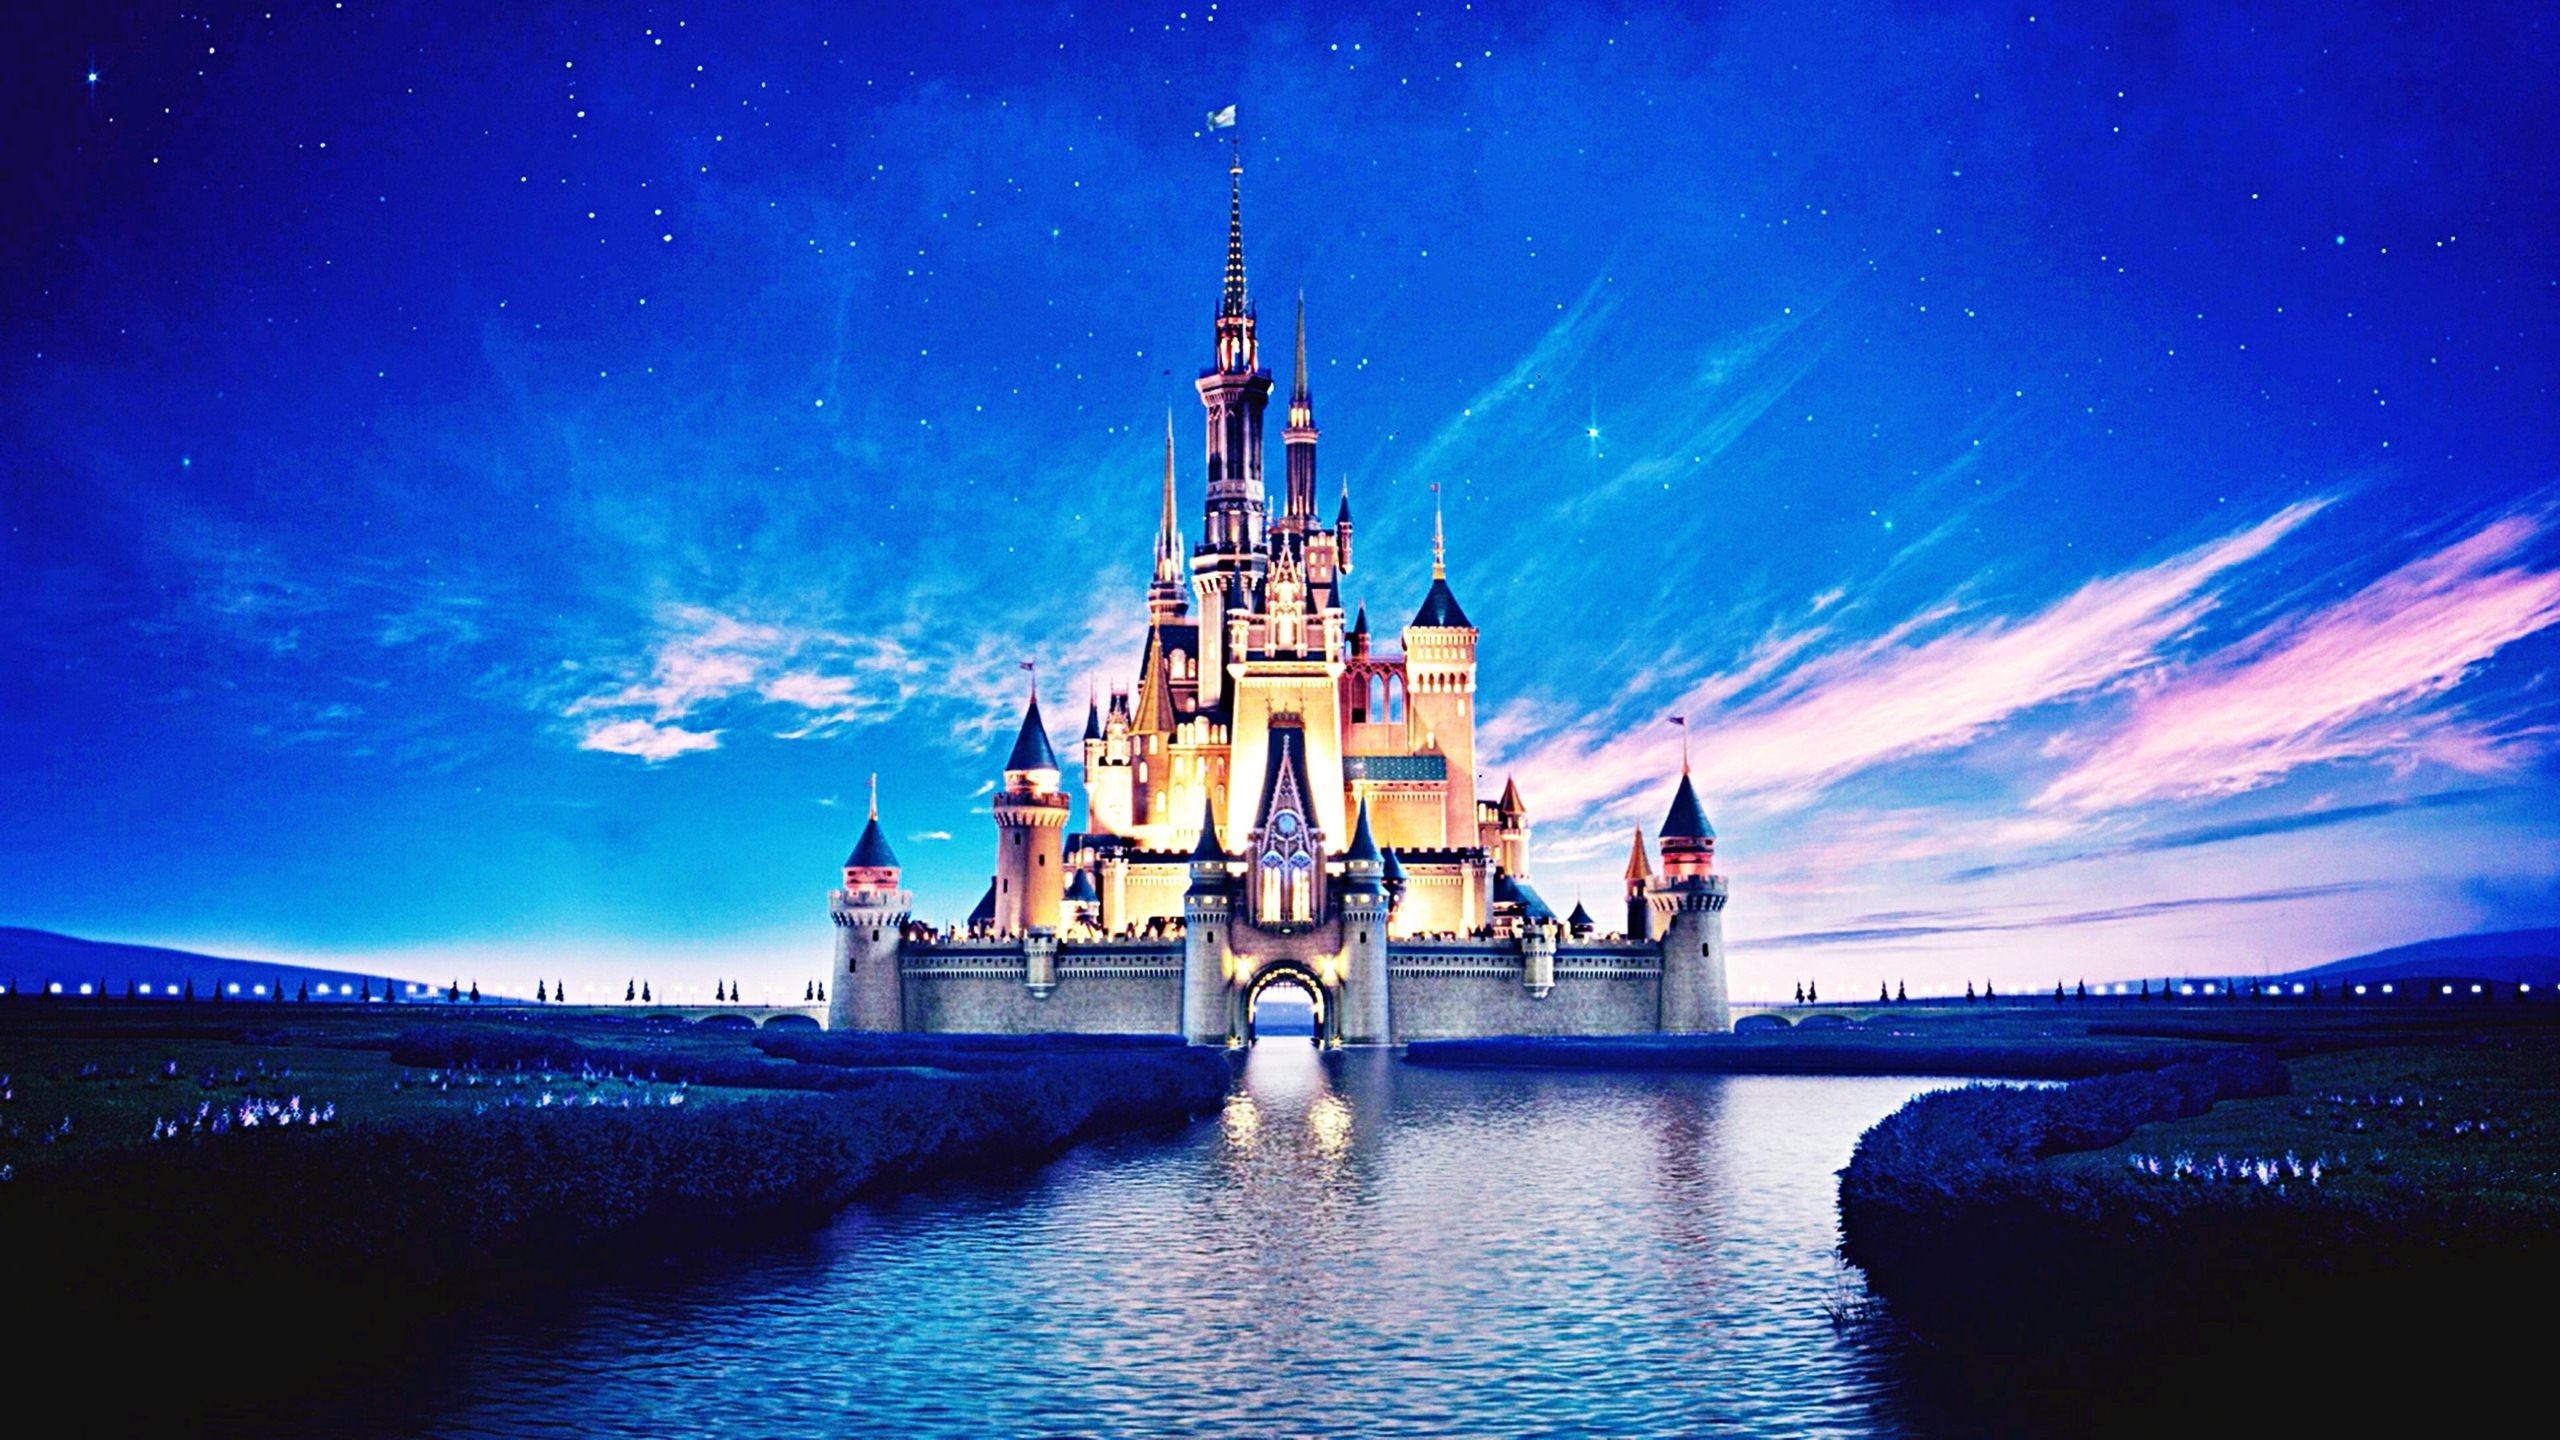 Cute Wallpapers Quotes Walt Disney Disney Castle Wallpapers Hd Pixelstalk Net